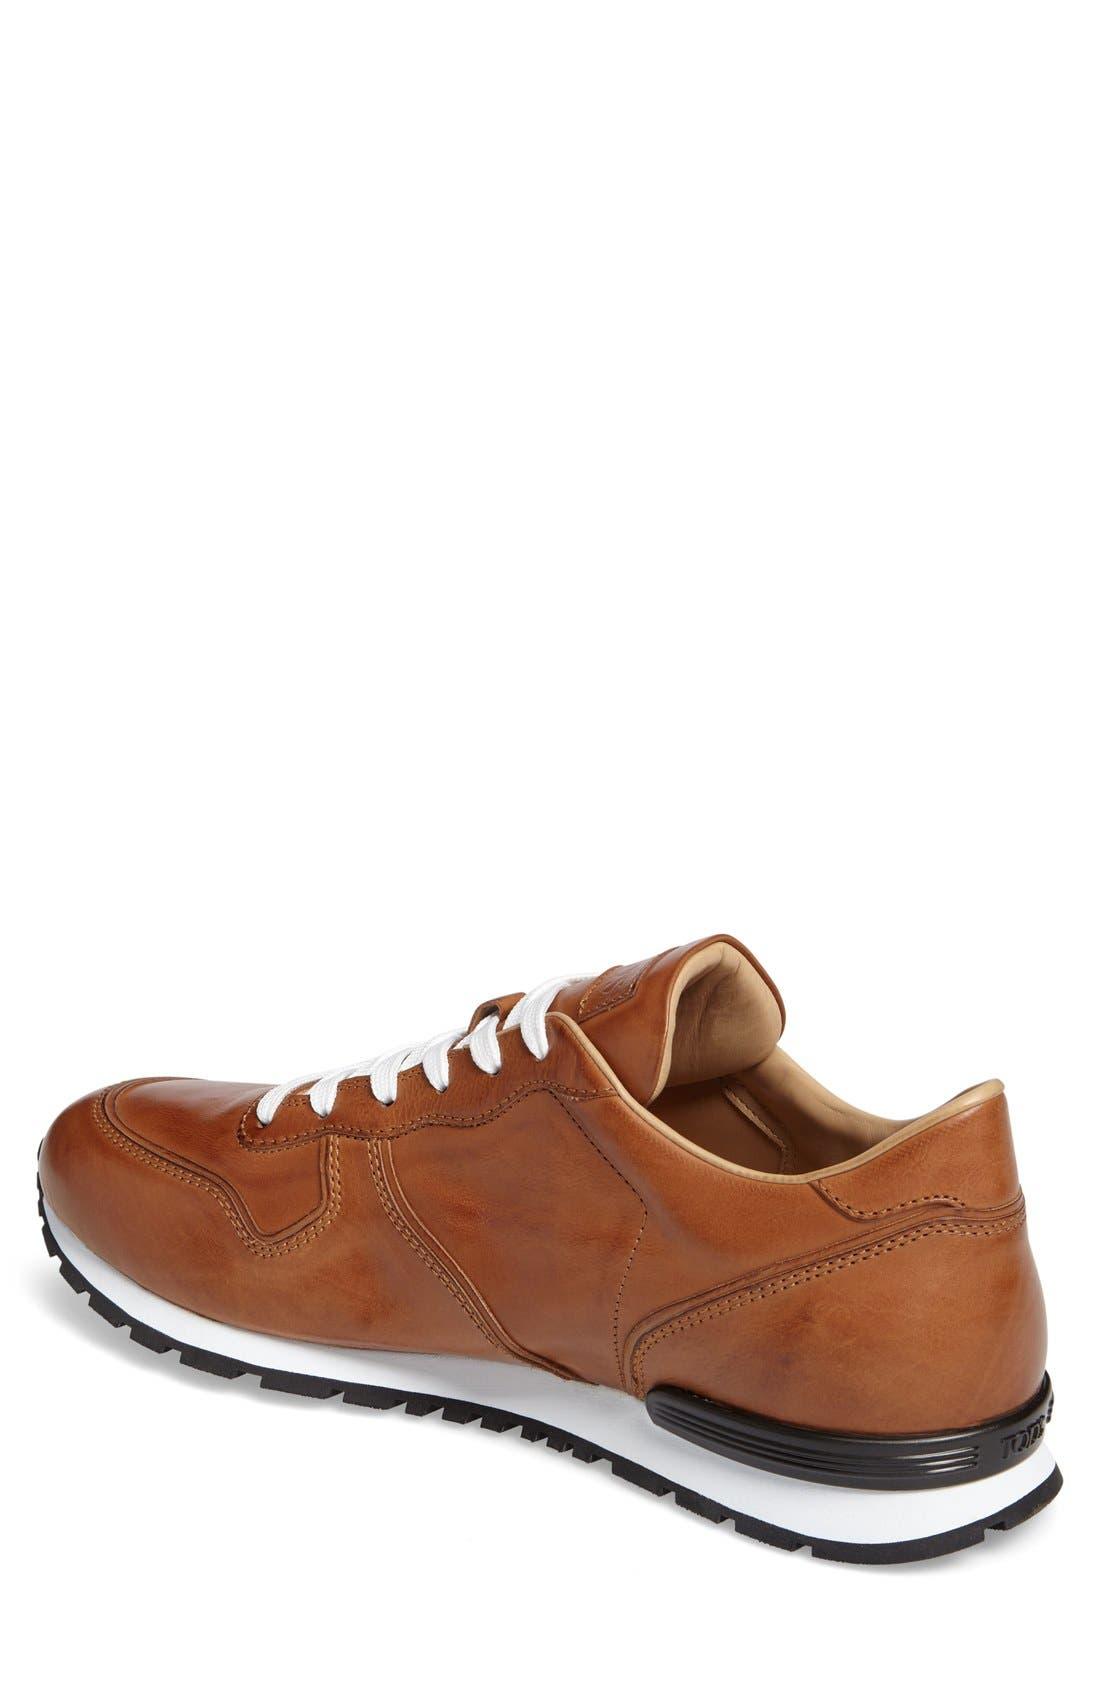 Alternate Image 2  - Tod's 'Allacciato' Sneaker (Men)